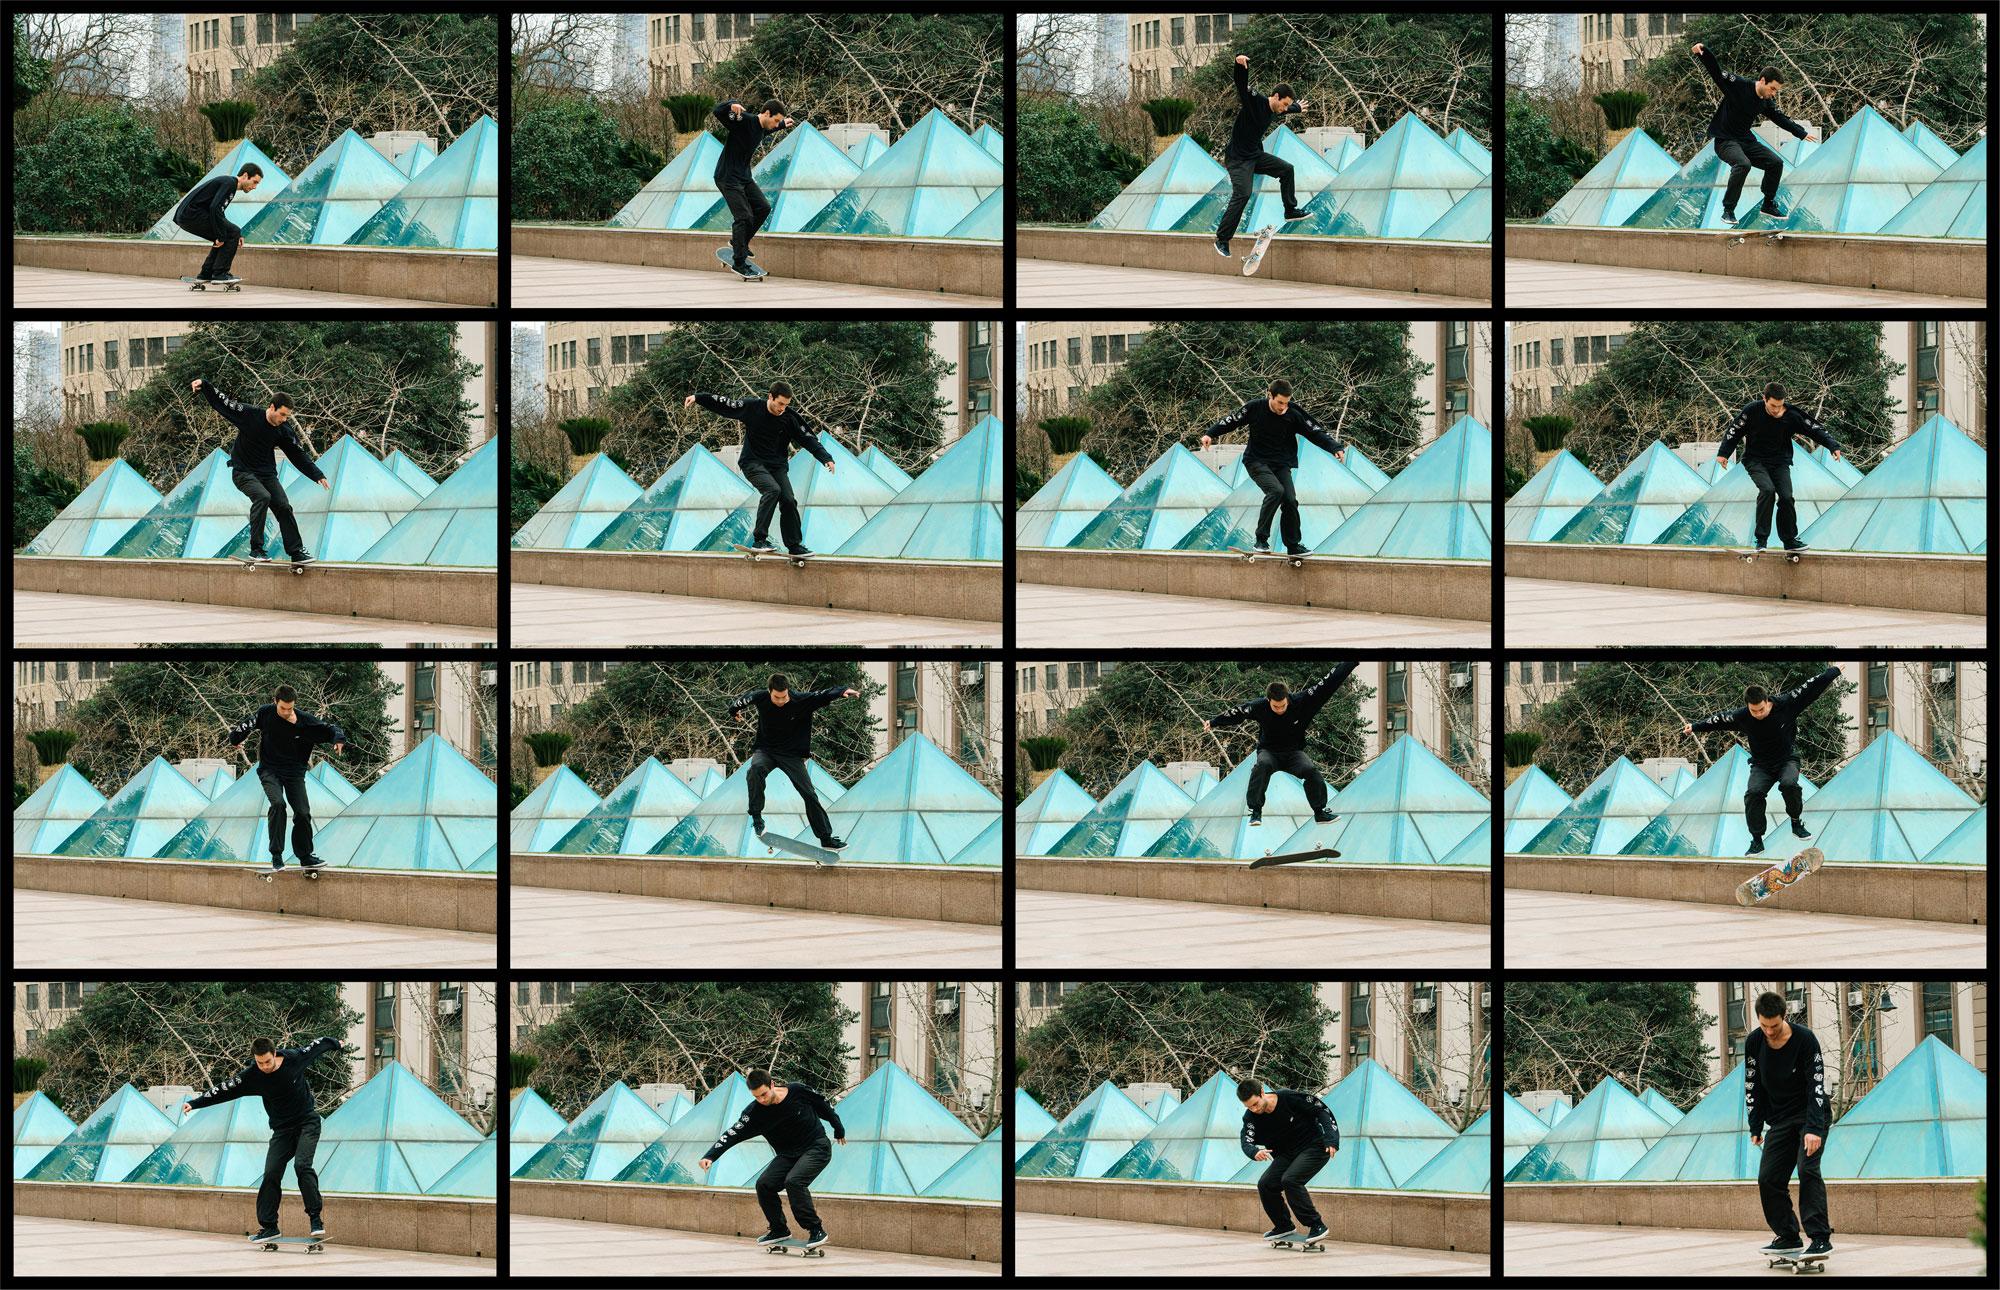 andrea-nollie-heel-tailslide-heelflip-out-sequence-small.jpg